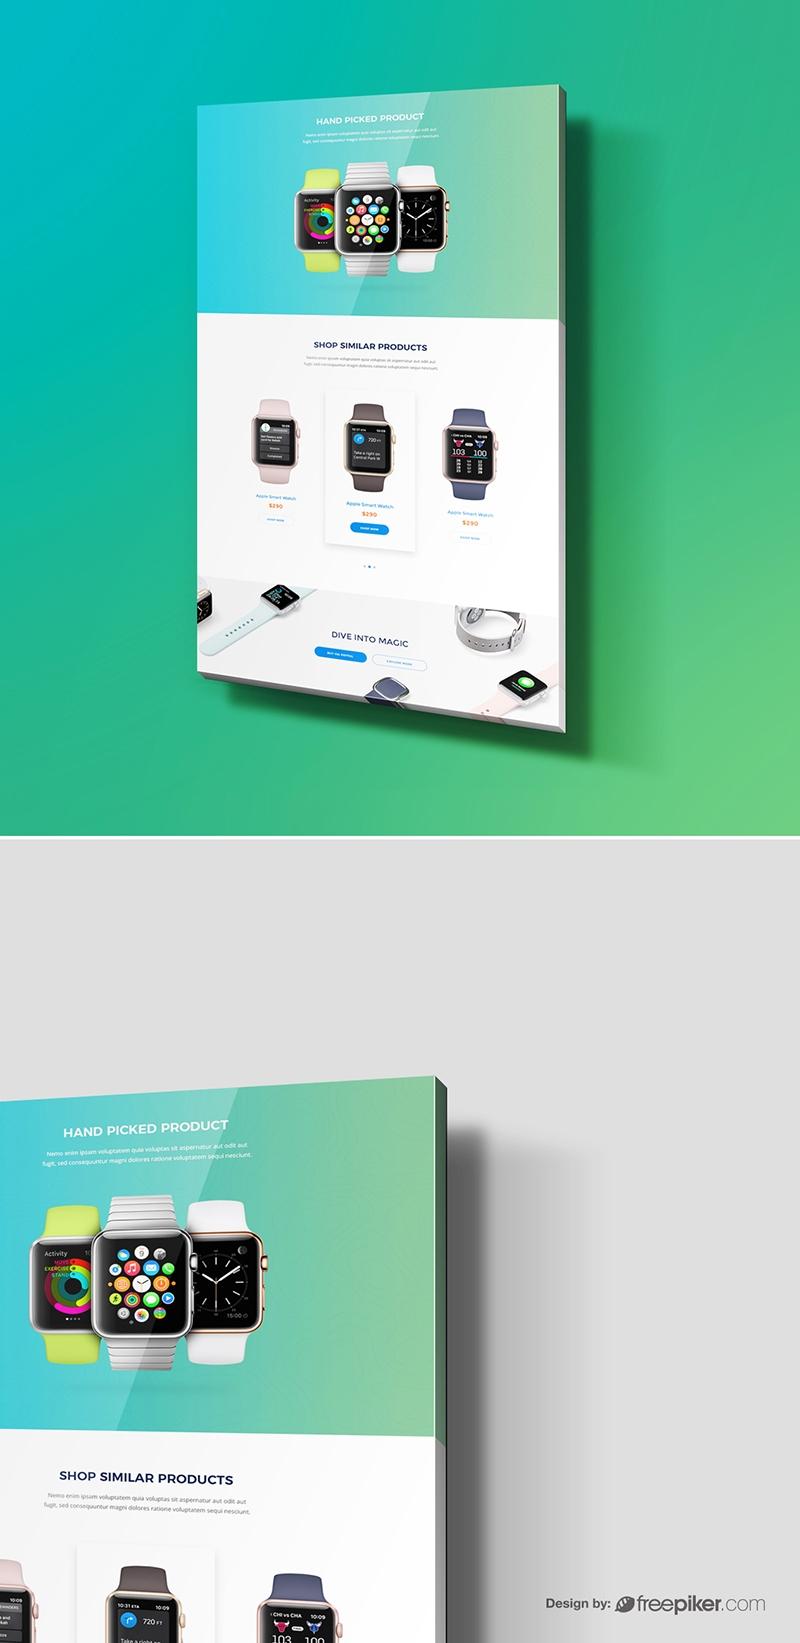 3D Web Display Showcase Mockup